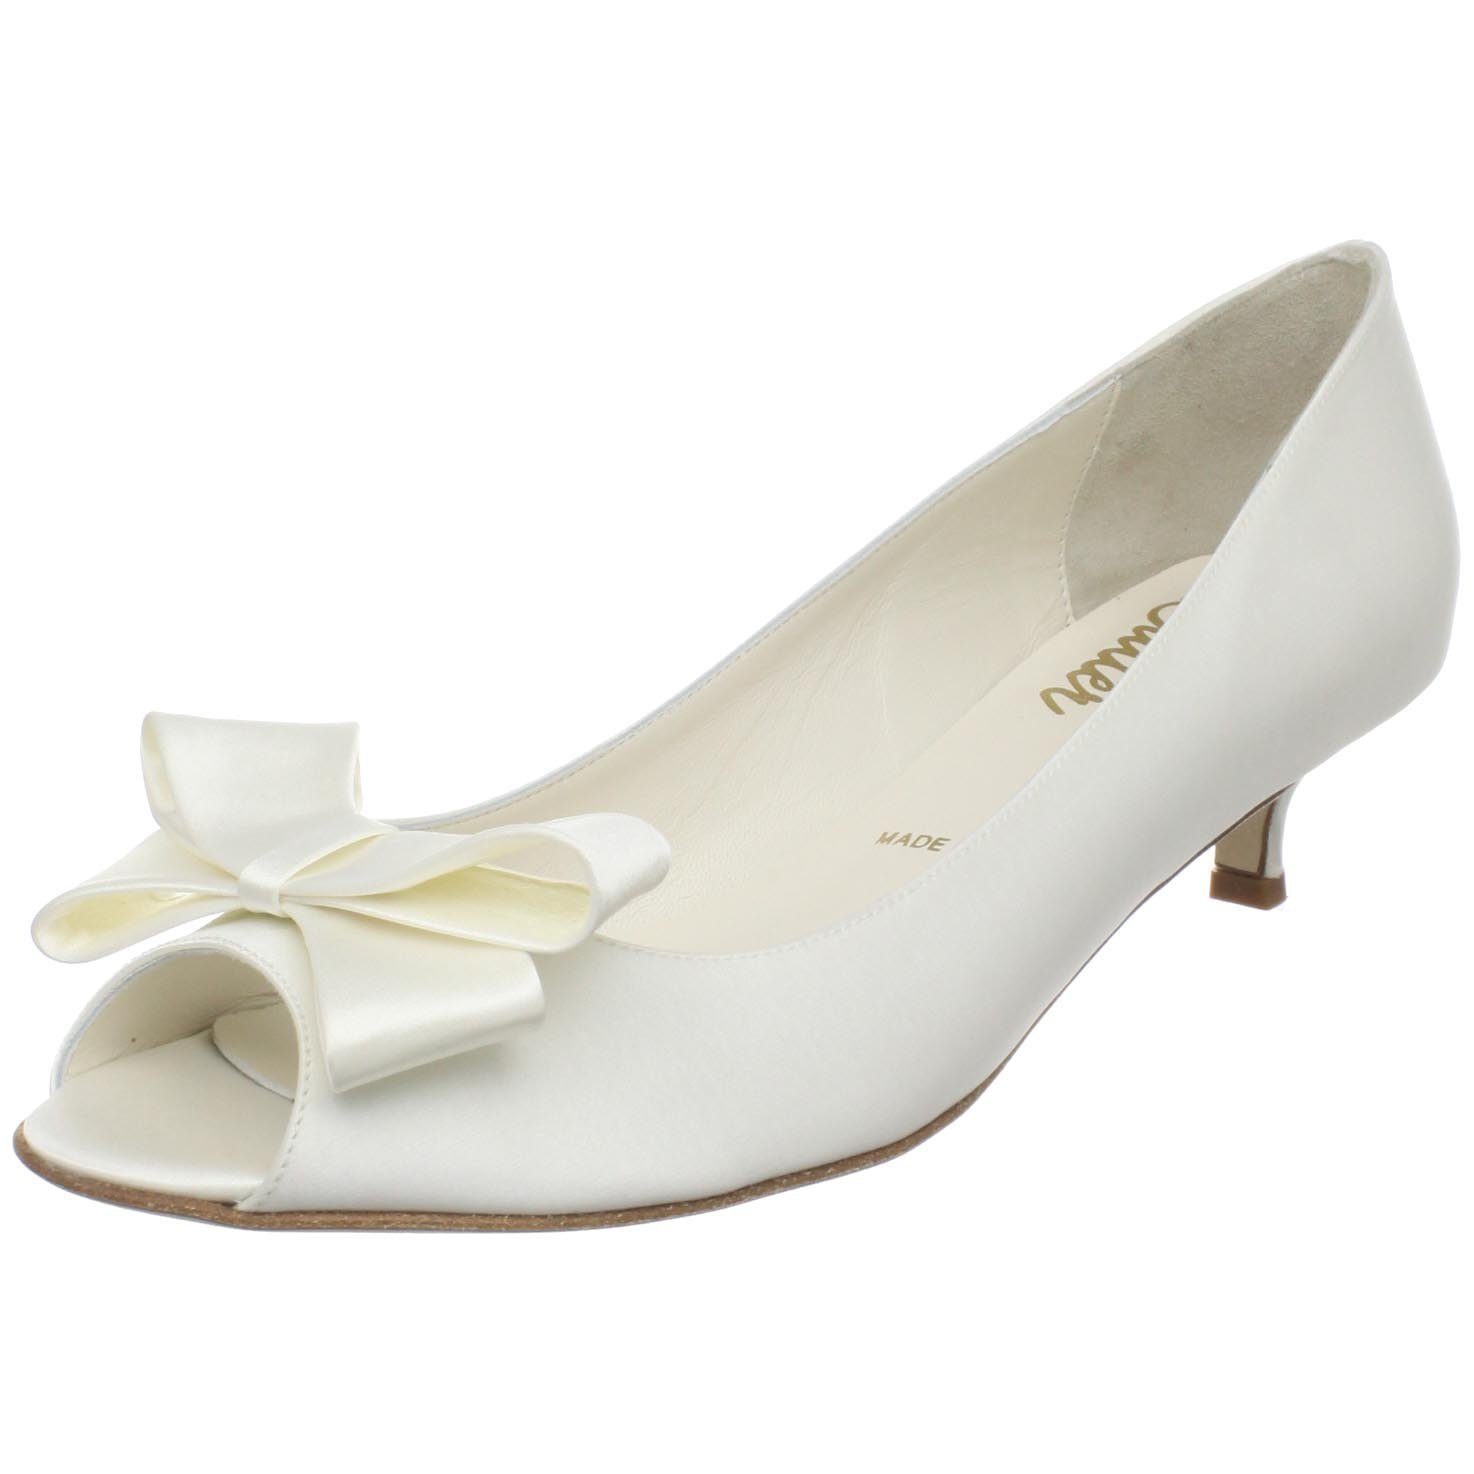 bridal shoes kitten heel photo - 1